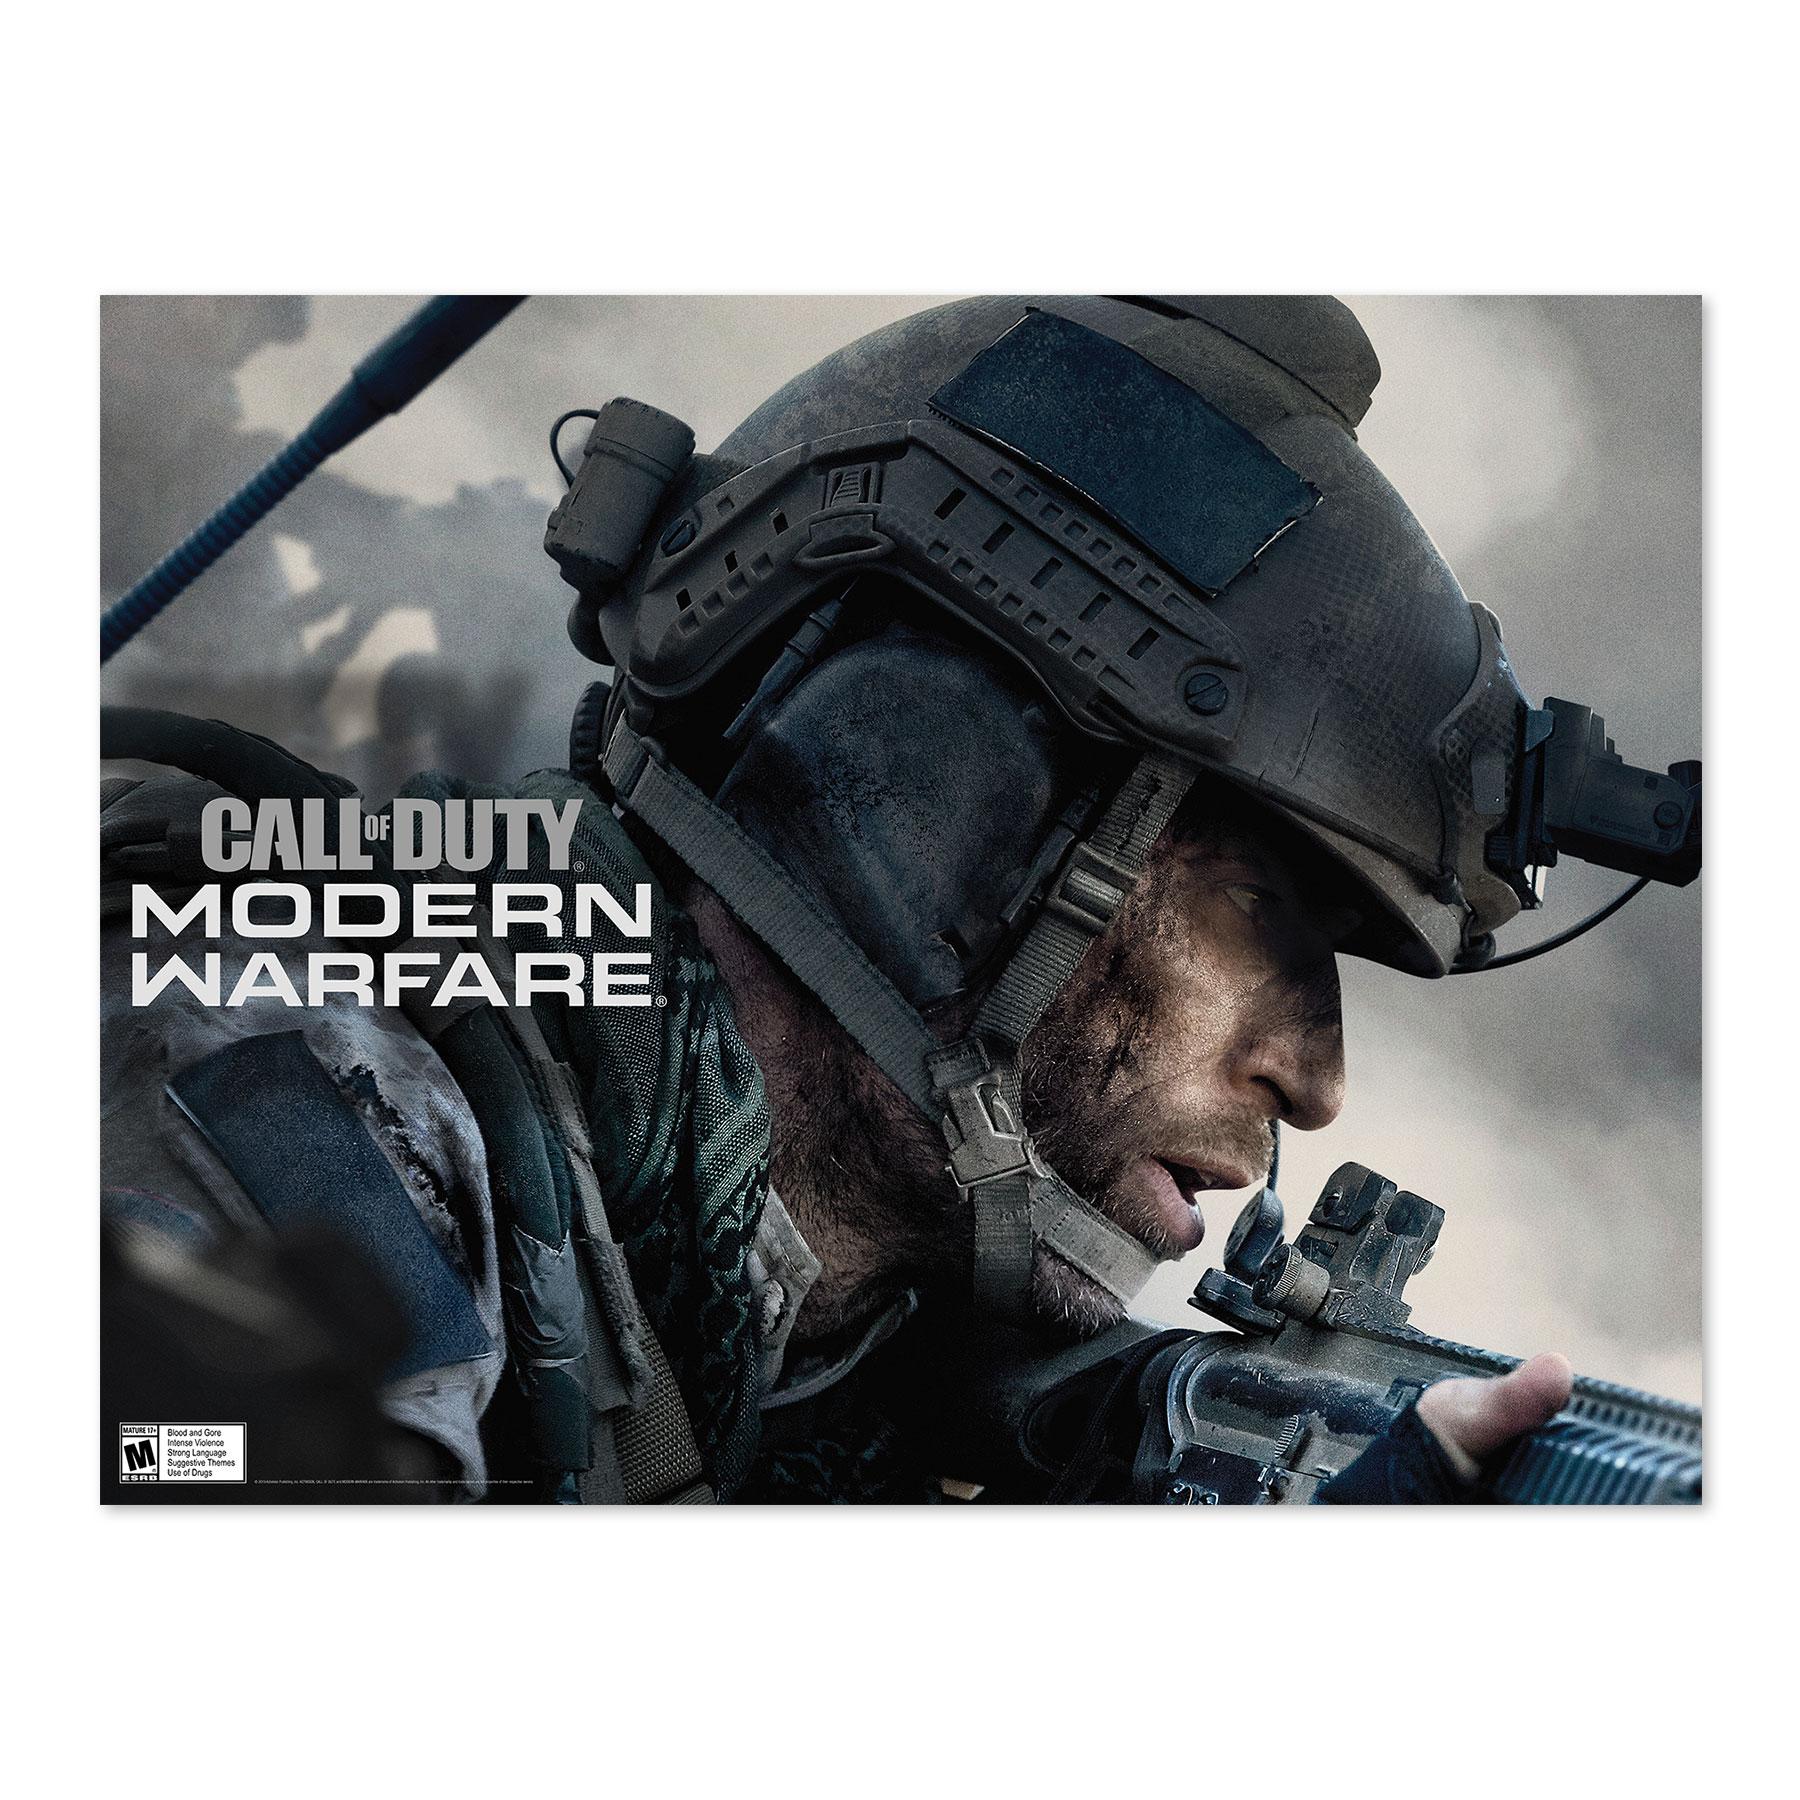 Call Of Duty Modern Warfare Window Cling